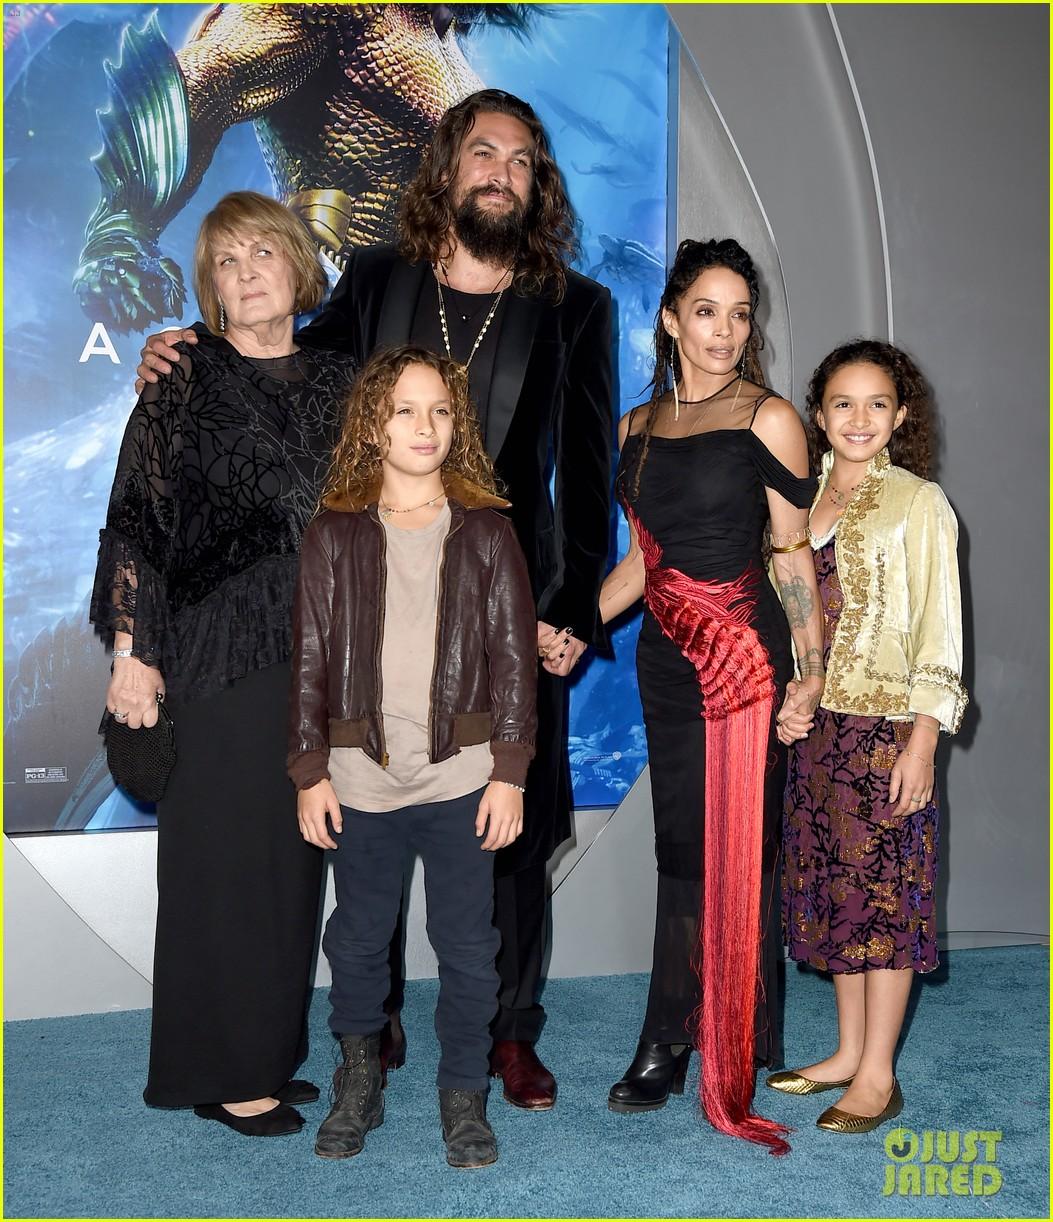 Jason Momoa Gets Support From Wife Lisa Bonet, Mom & Kids